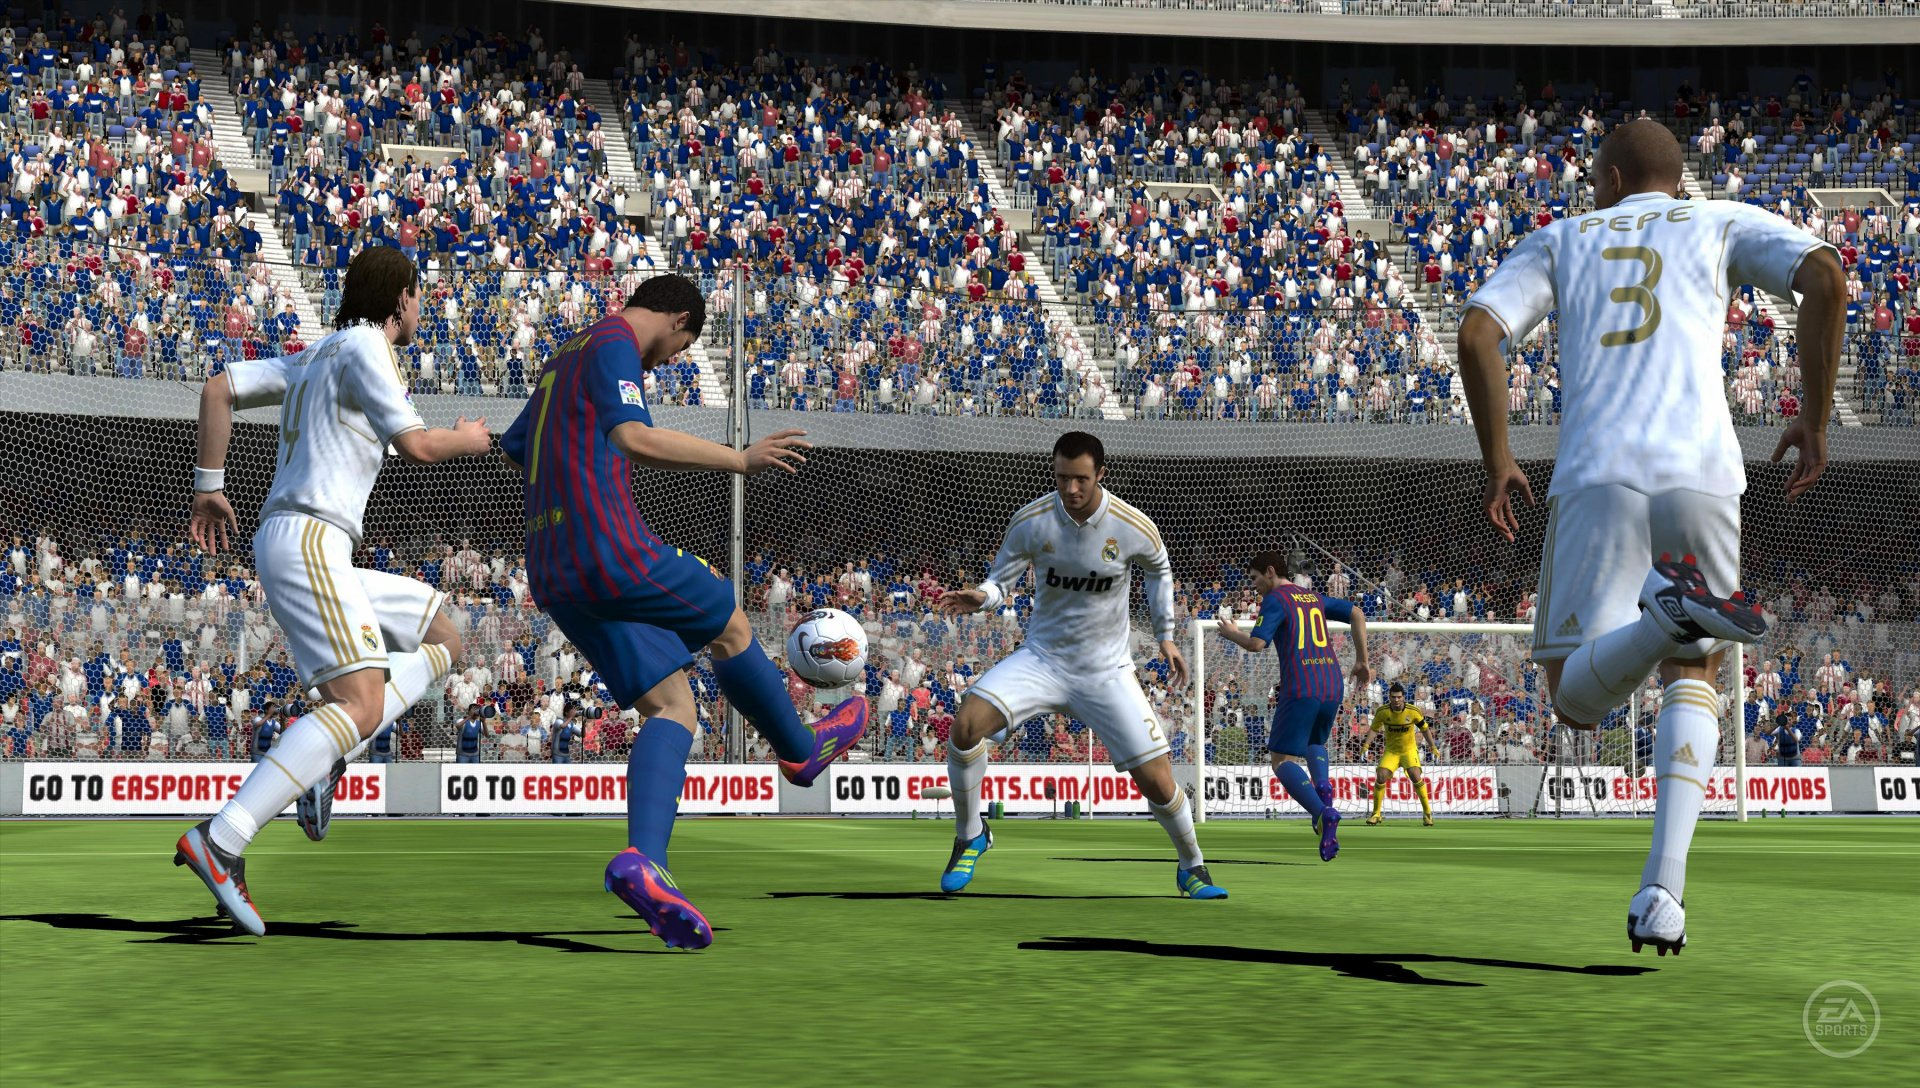 Soccer Football Sport Game: EA Sports FIFA Football (PS Vita / PlayStation Vita) News